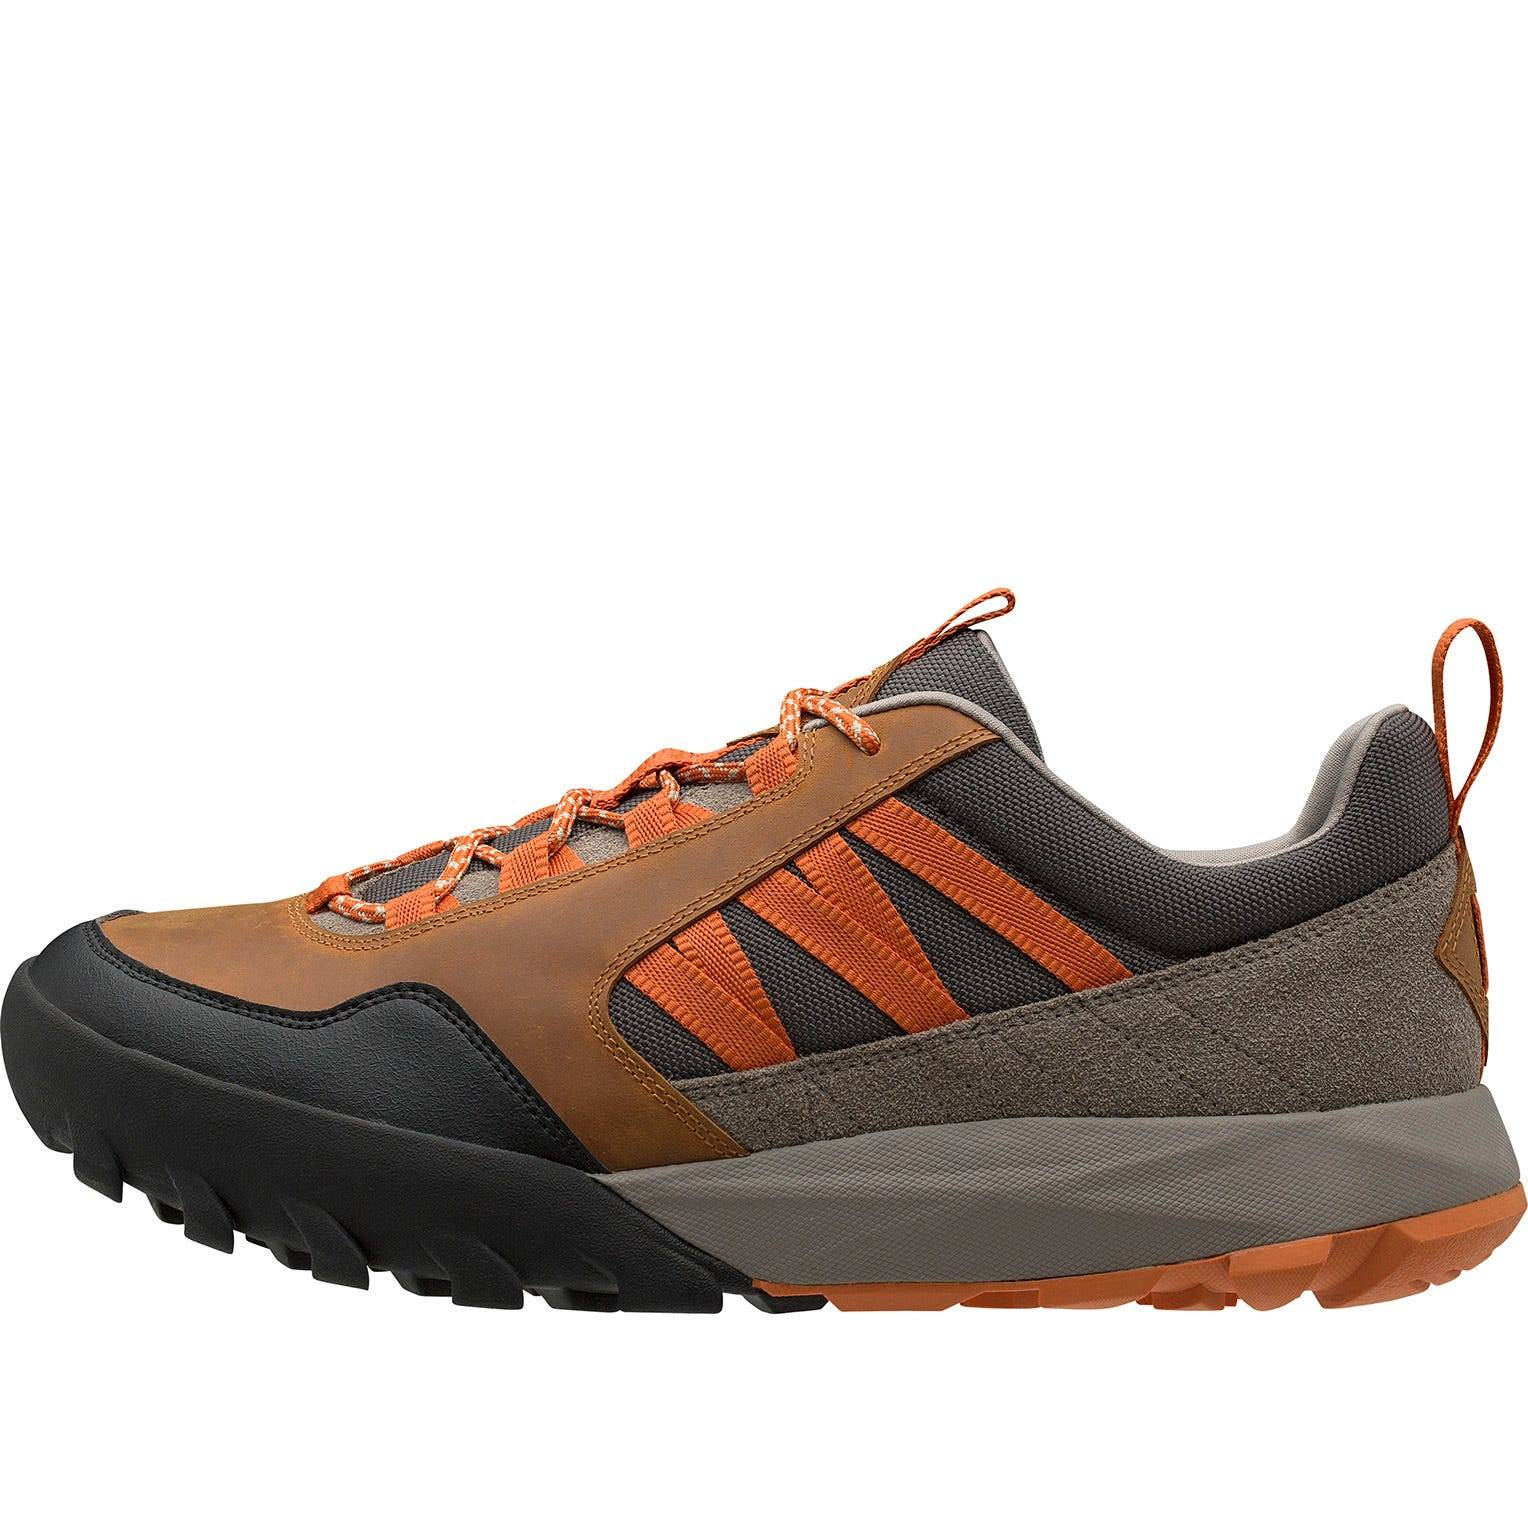 Helly Hansen Loke Bowron Leather Hiking Boot Brown 44/10